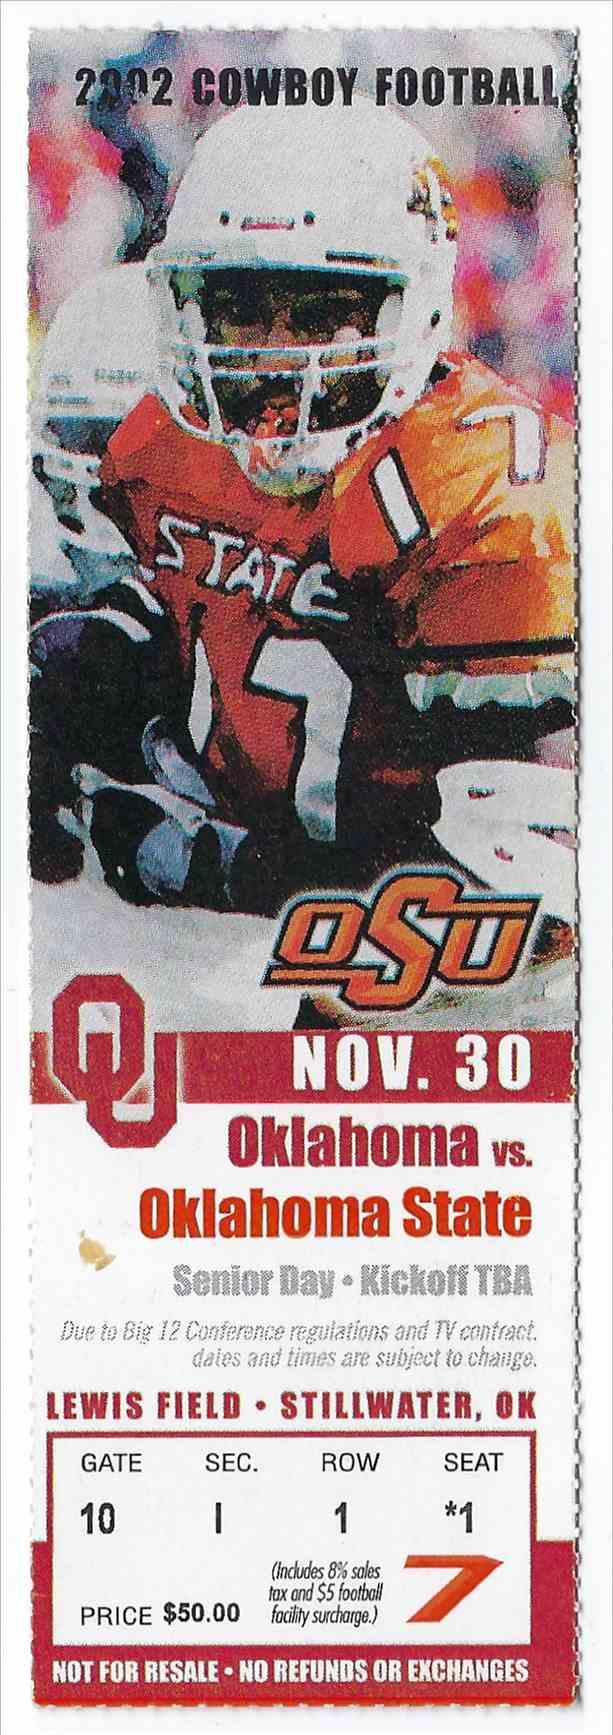 2002 College Football Ticket Stub Oklahoma Vs Oklahoma State Bedlam card front image